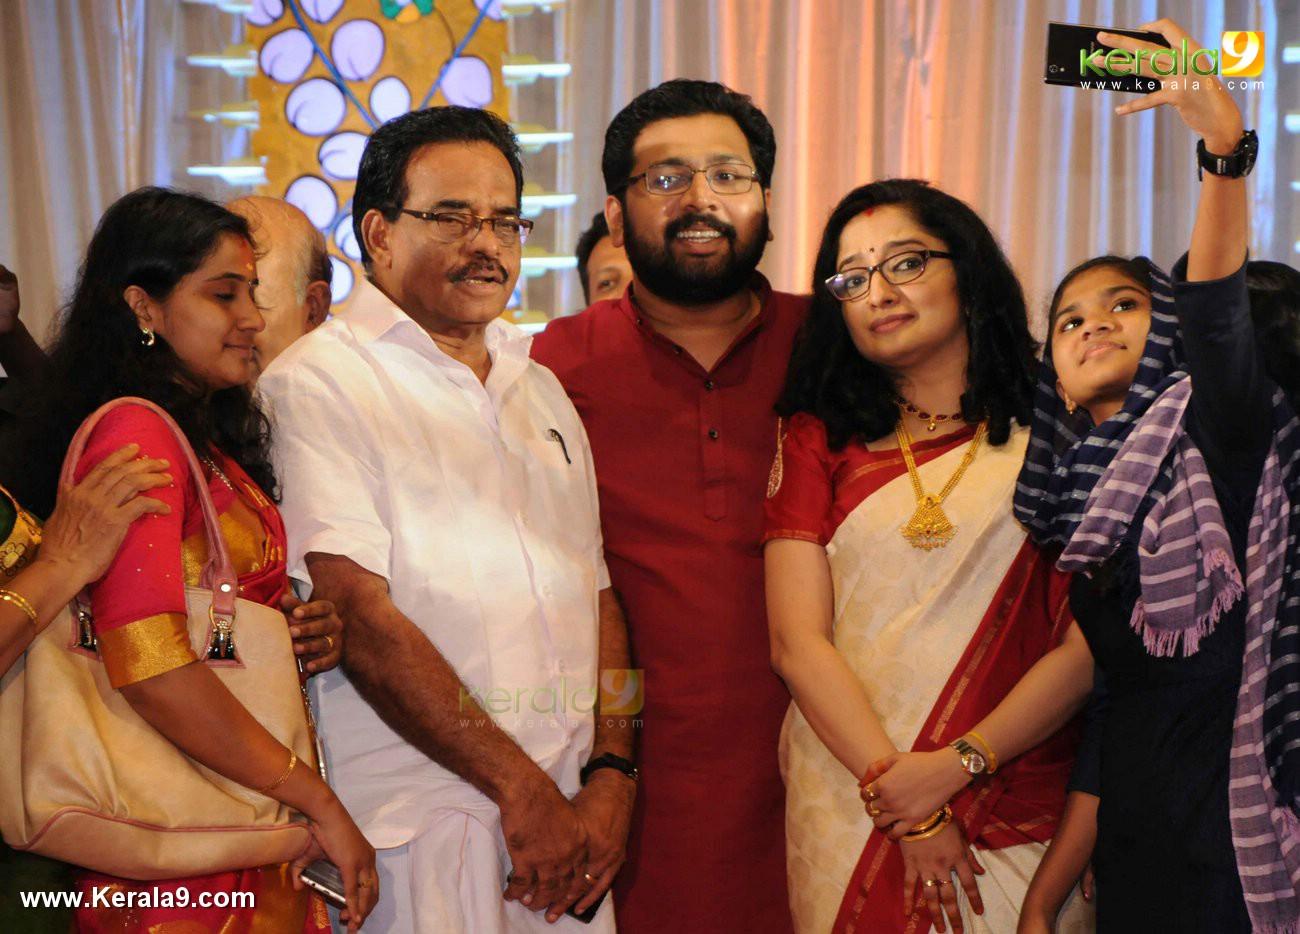 sabarinathan mla marriage photos